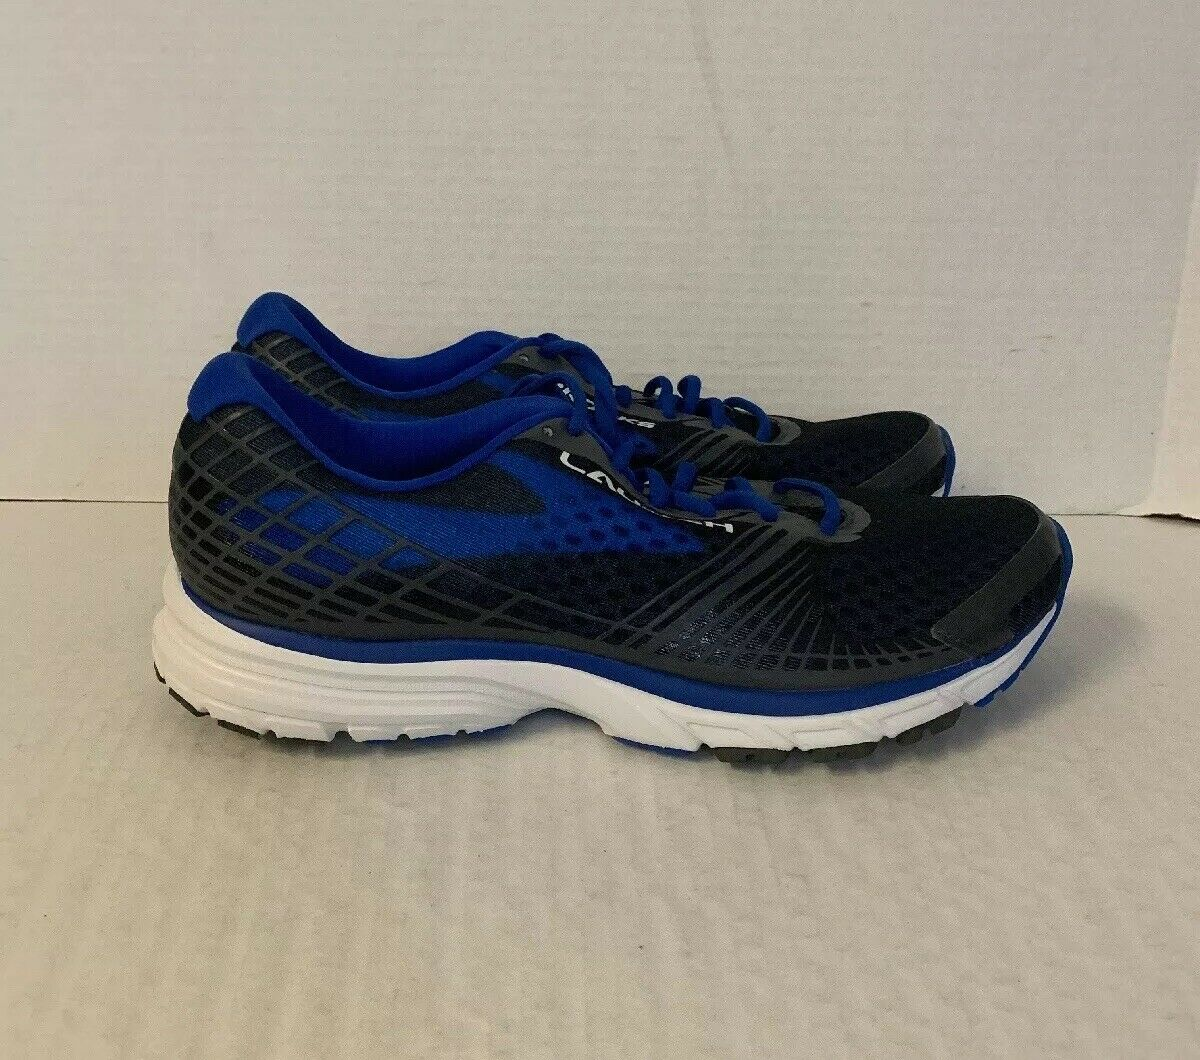 BROOKS LAUNCH 3 Para hombres Zapatos deportivos atléticos tamaño 10.5 Azul 1102151D105